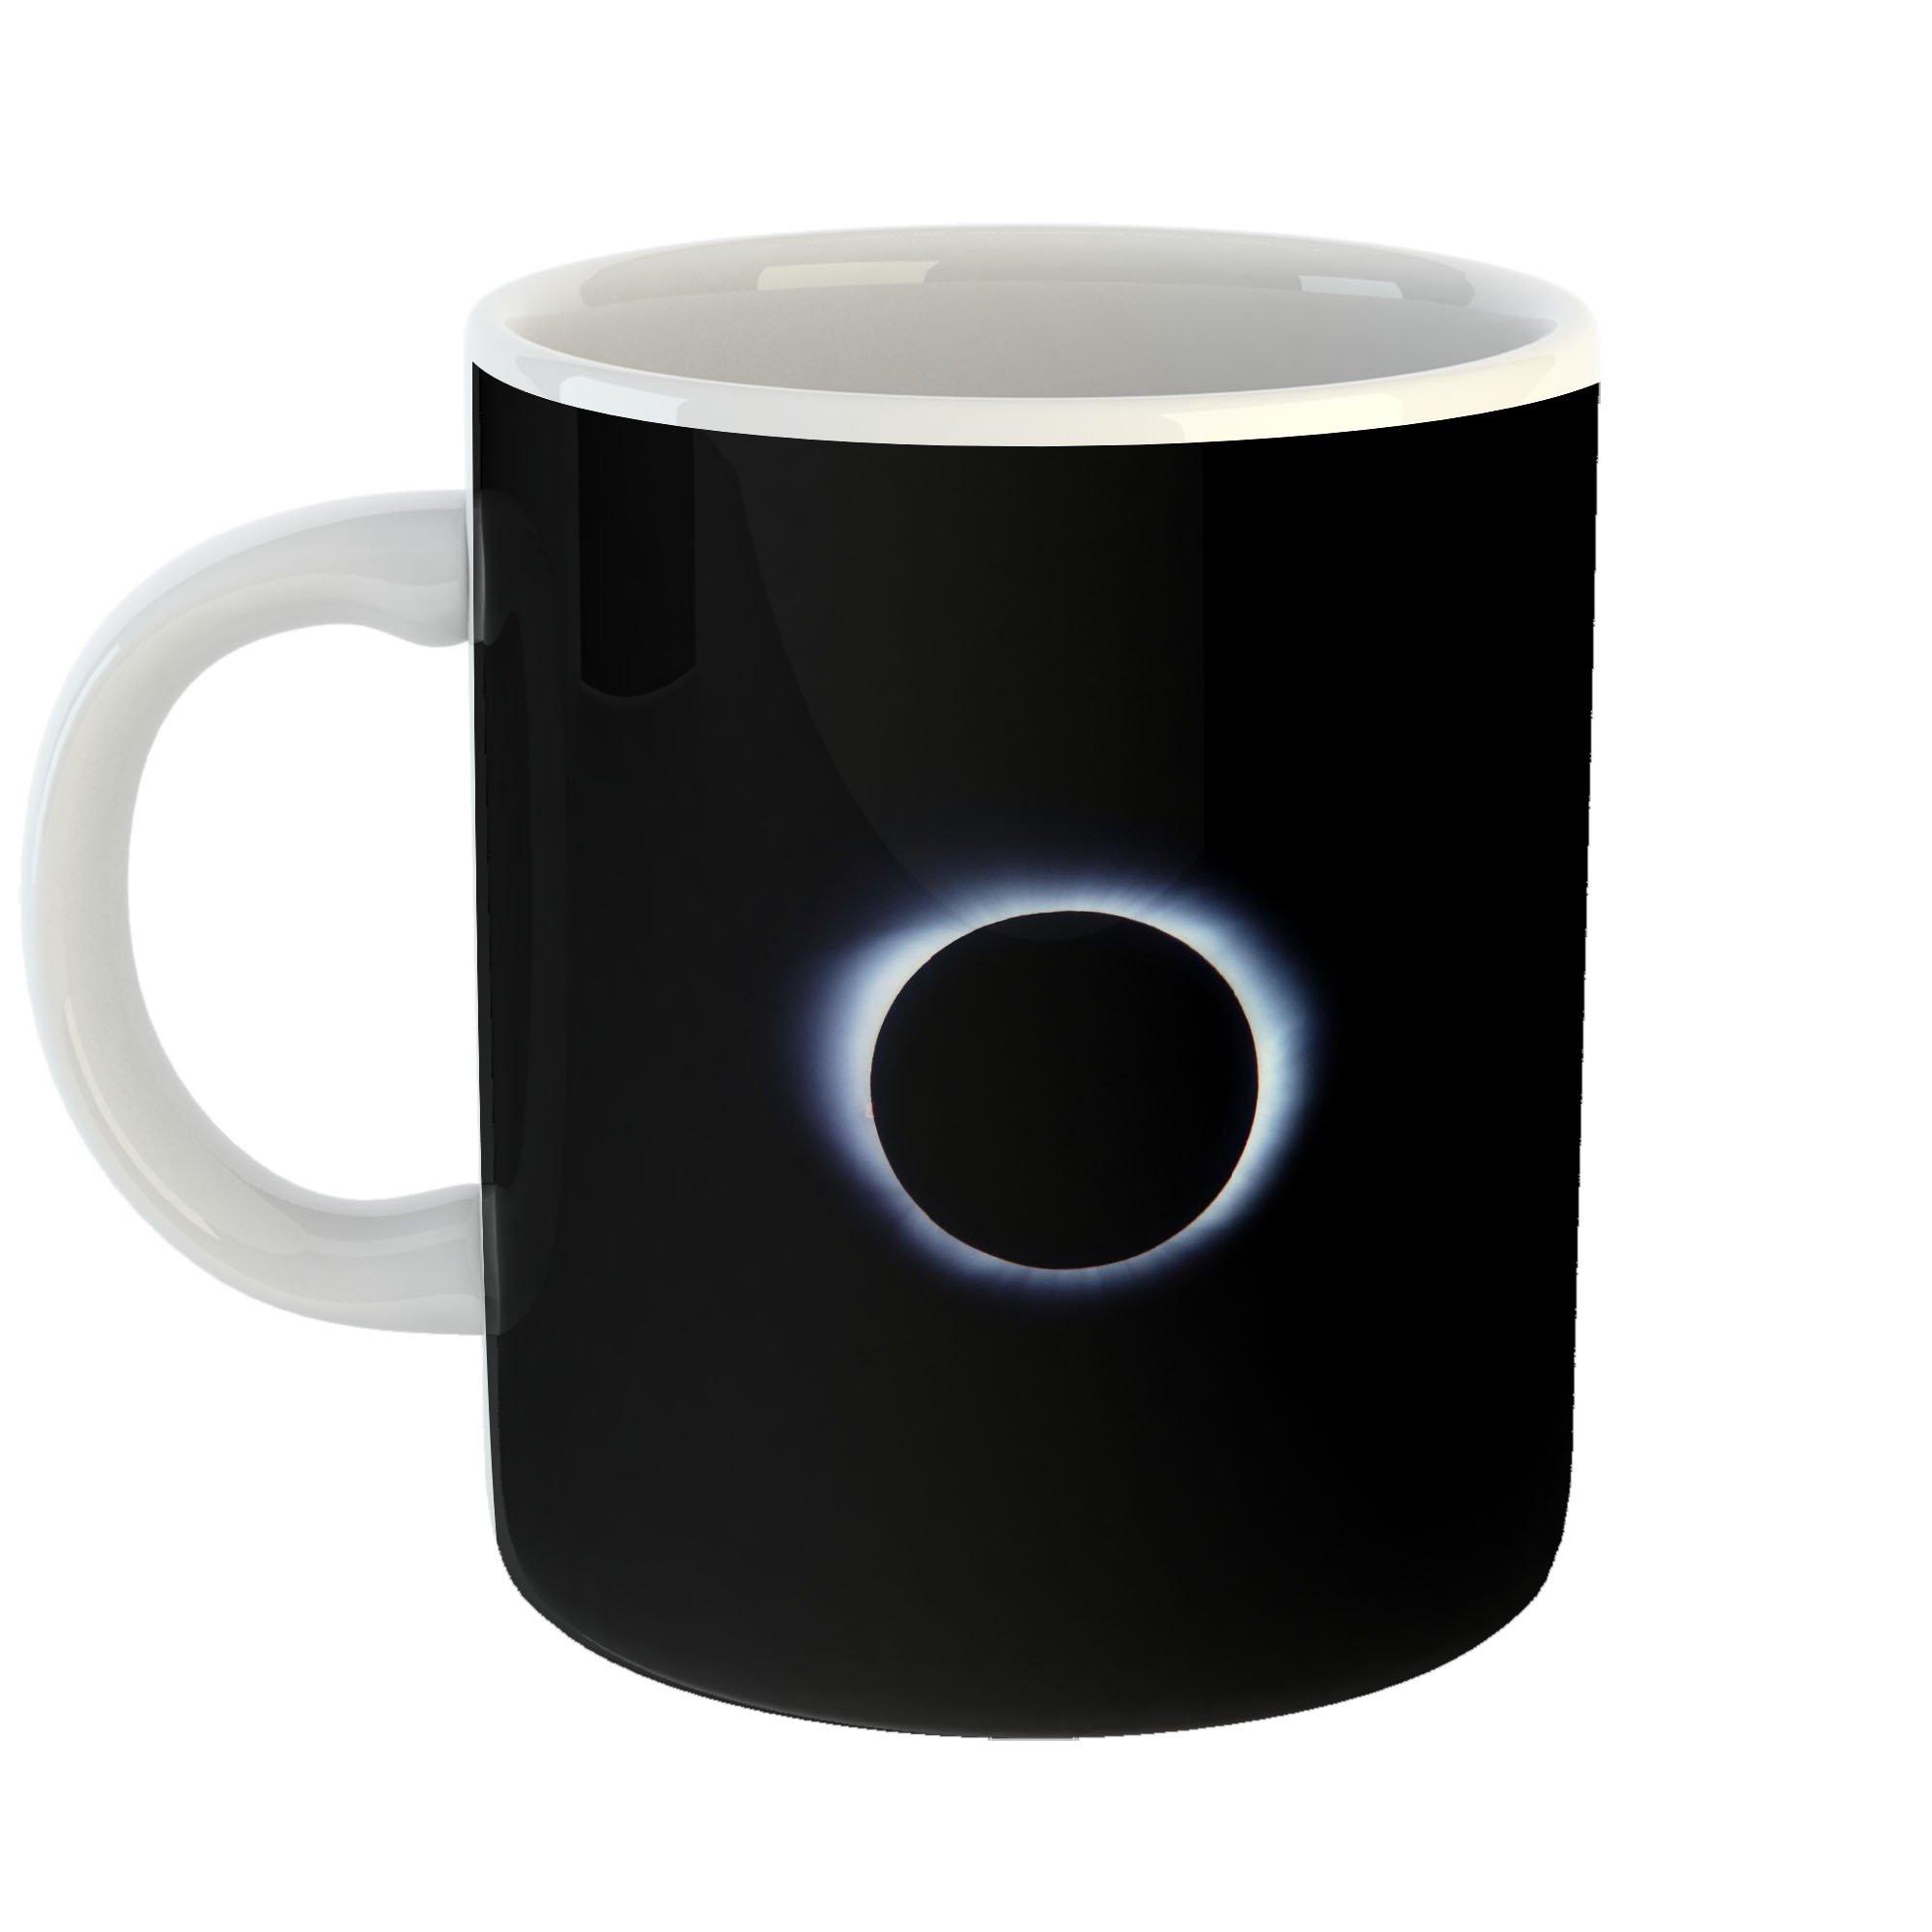 Westlake Art - Moon Solar - 11oz Coffee Cup Mug - Modern Picture Photography Artwork Home Office Birthday Gift - 11 Ounce (160B-E1DD0)